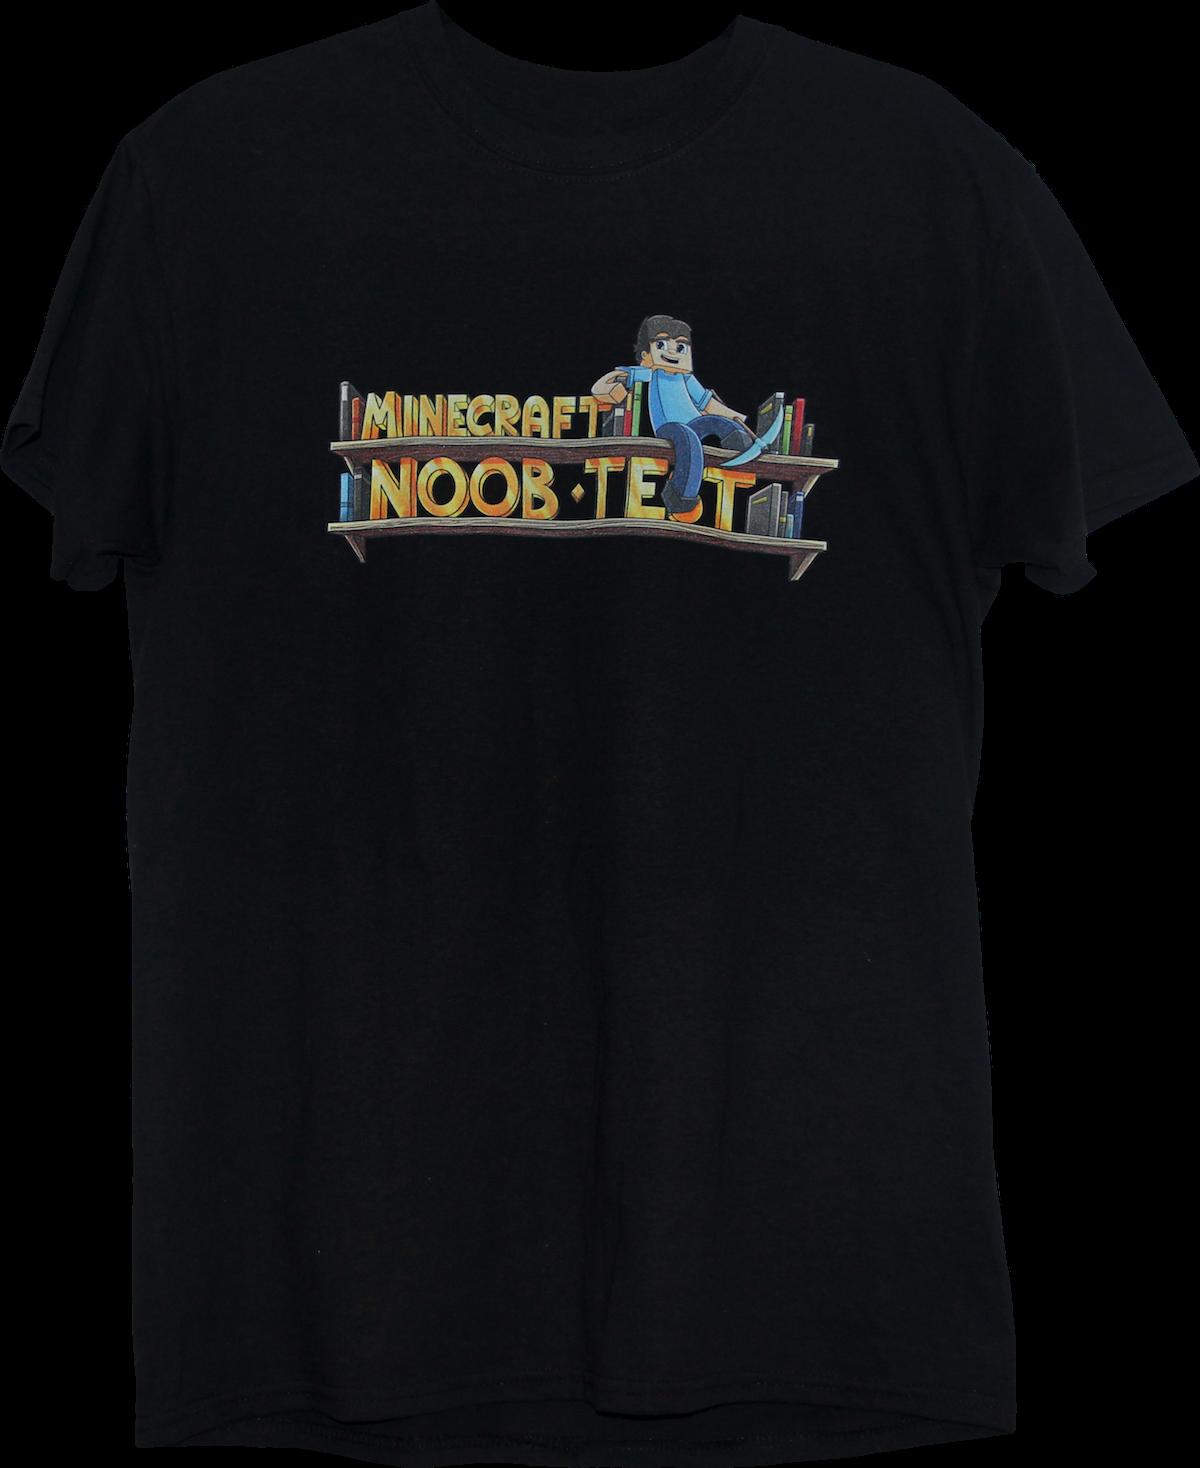 Minecraft Noob Test - One Sided Logo T-Shirt